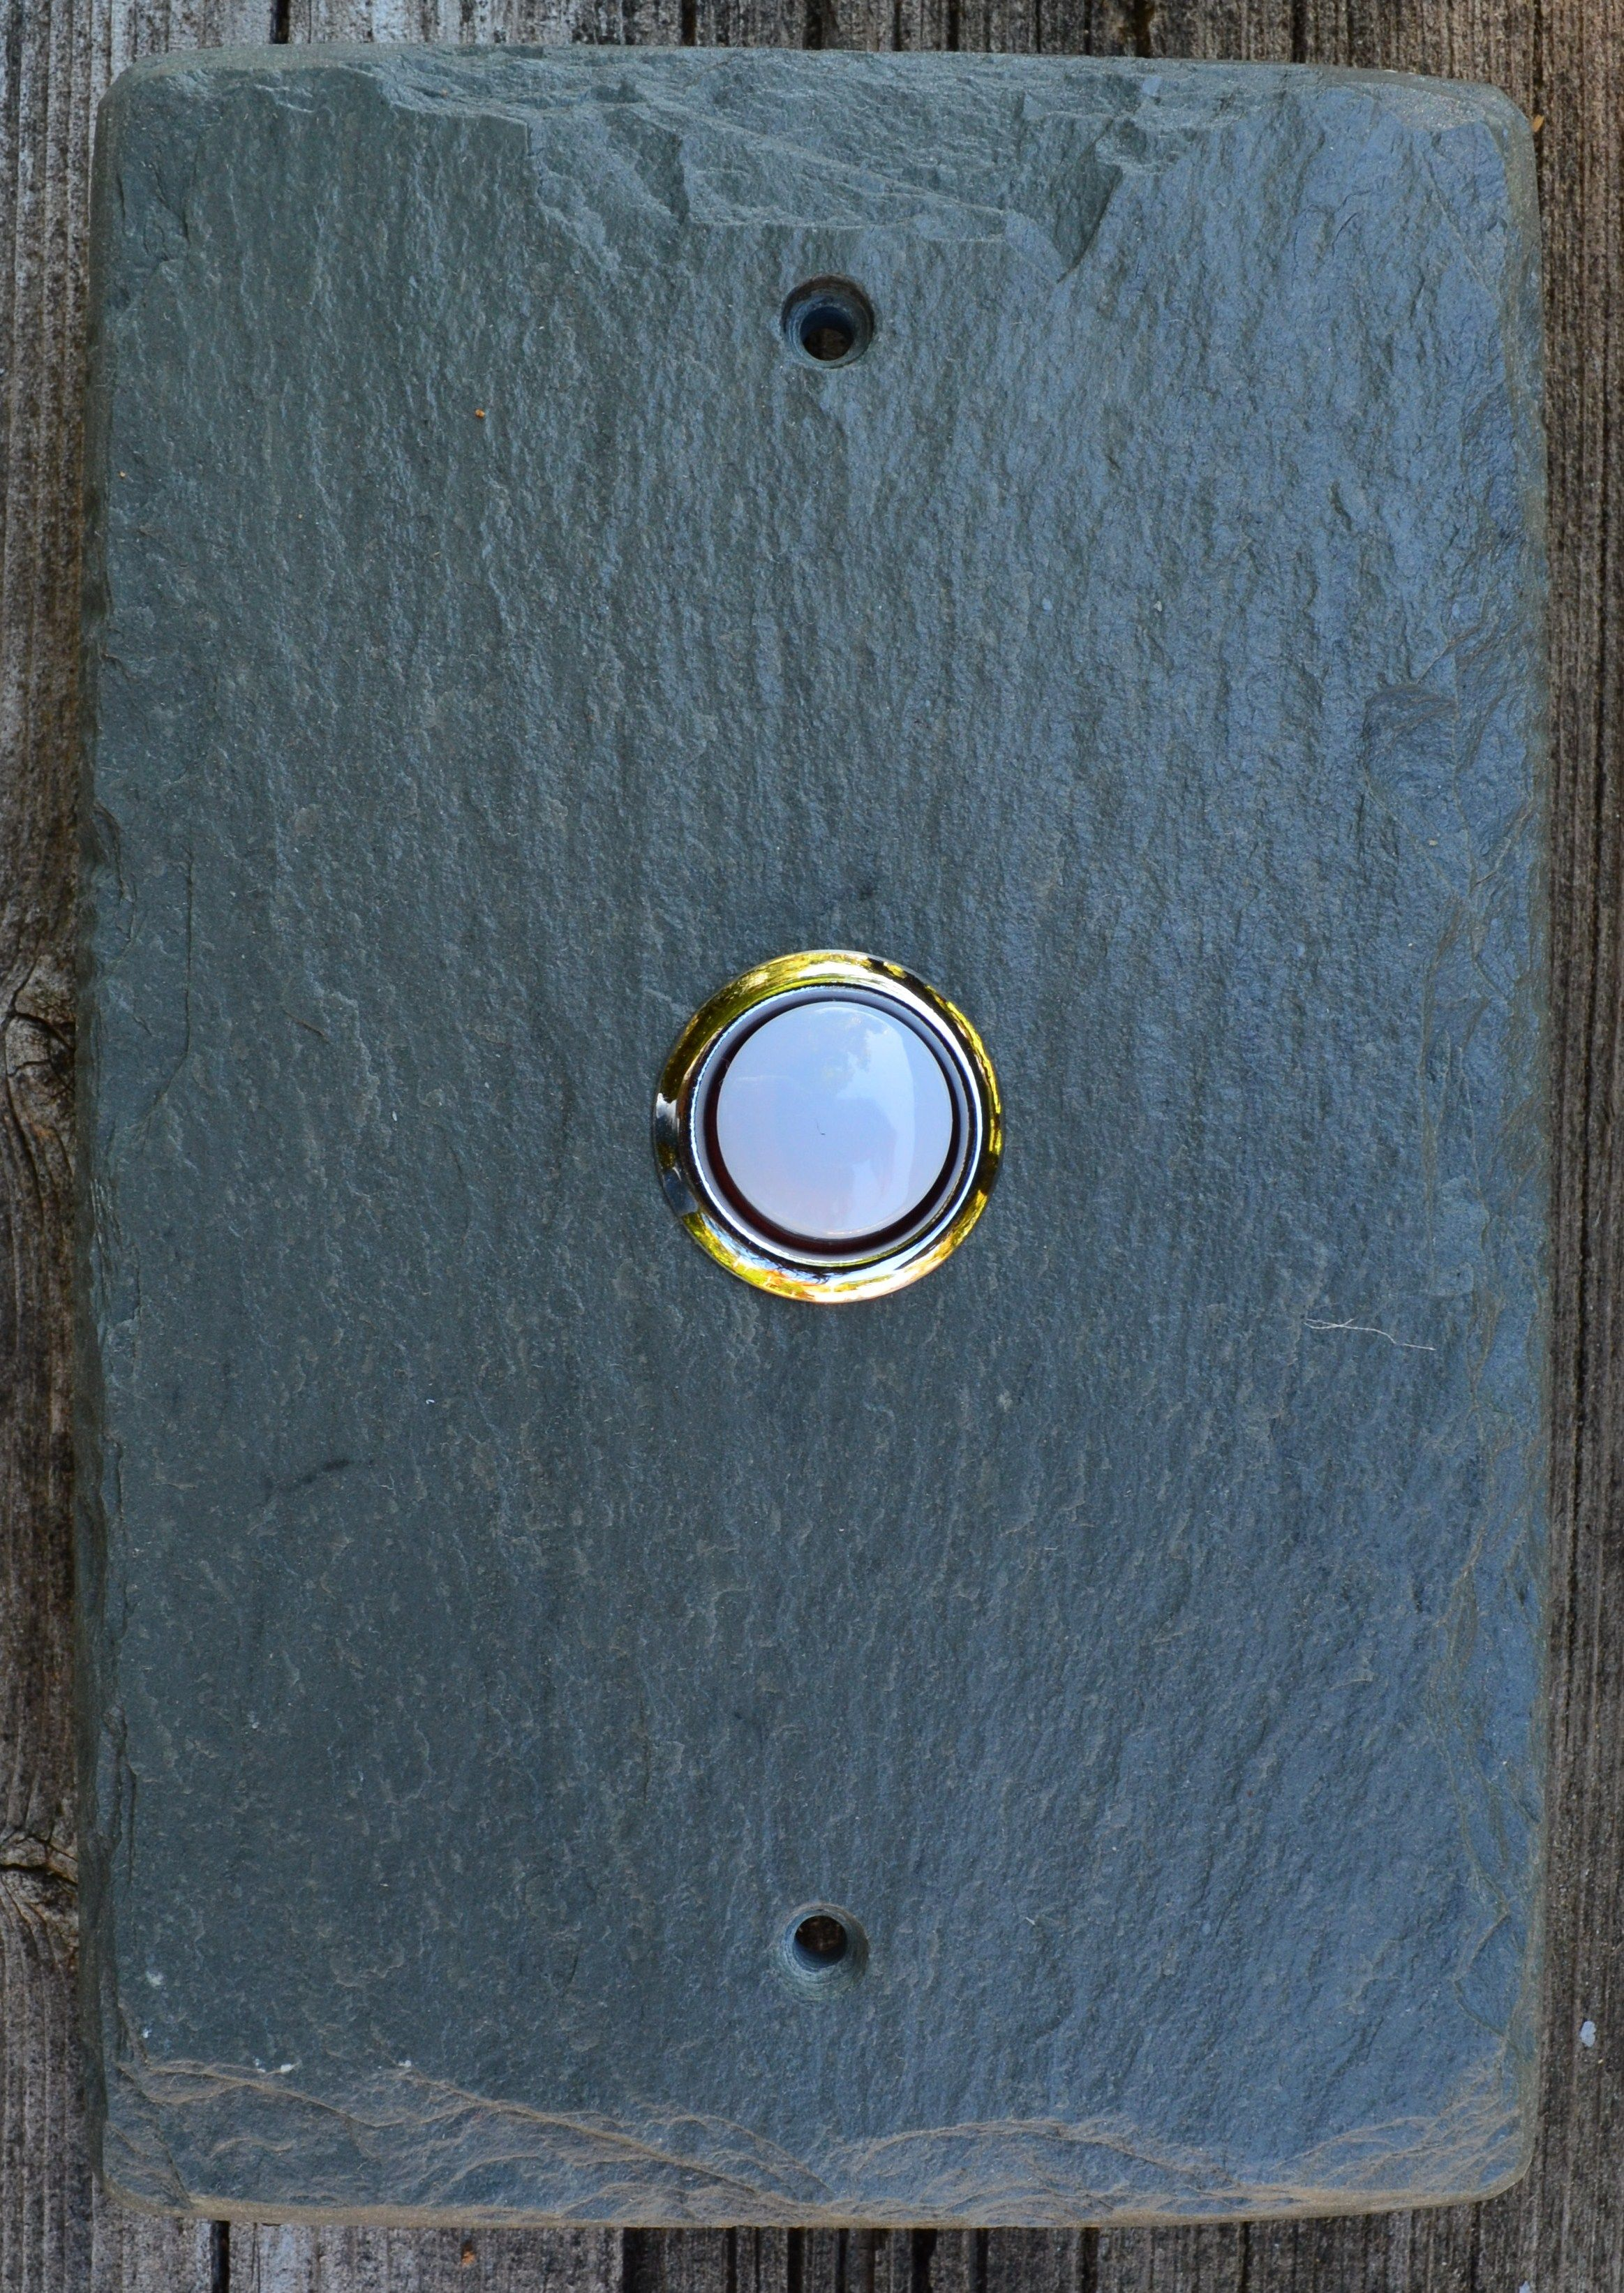 Slate Doorbell Plate In Vermont Gray Slate, By Vermont Slate Art.